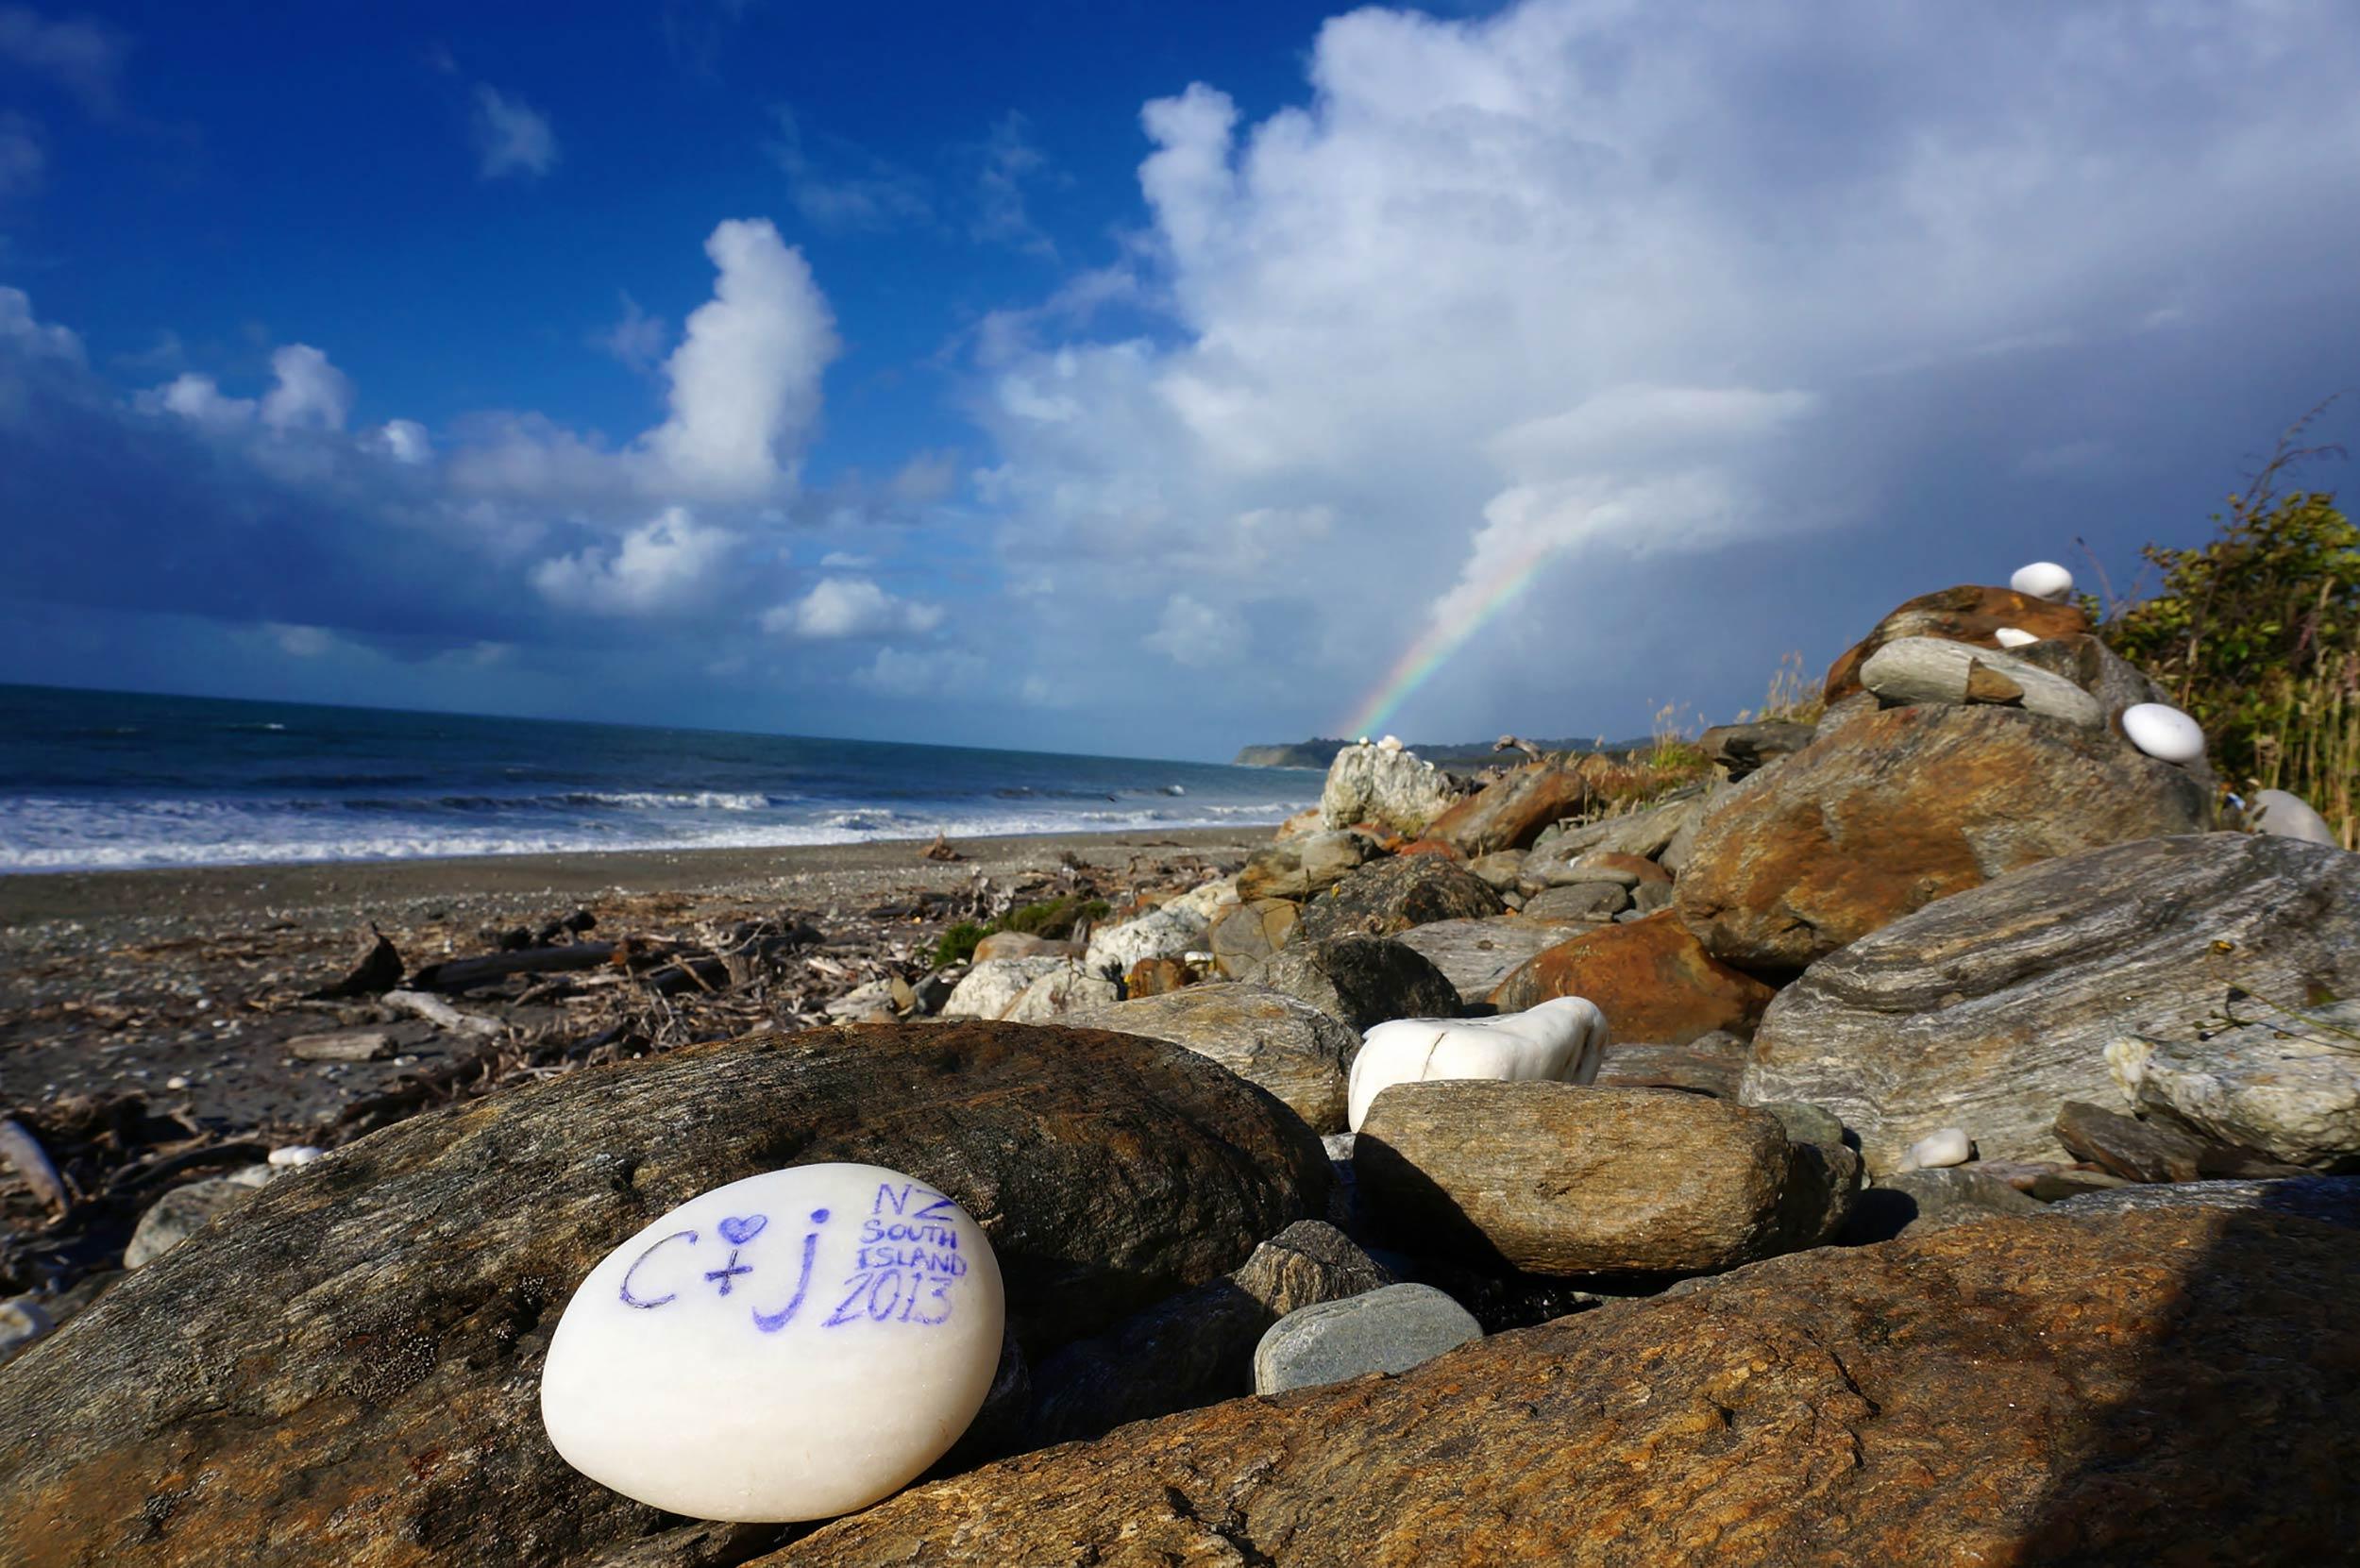 art_stones_on_way_to_hokitika_west_coast_nz.jpg